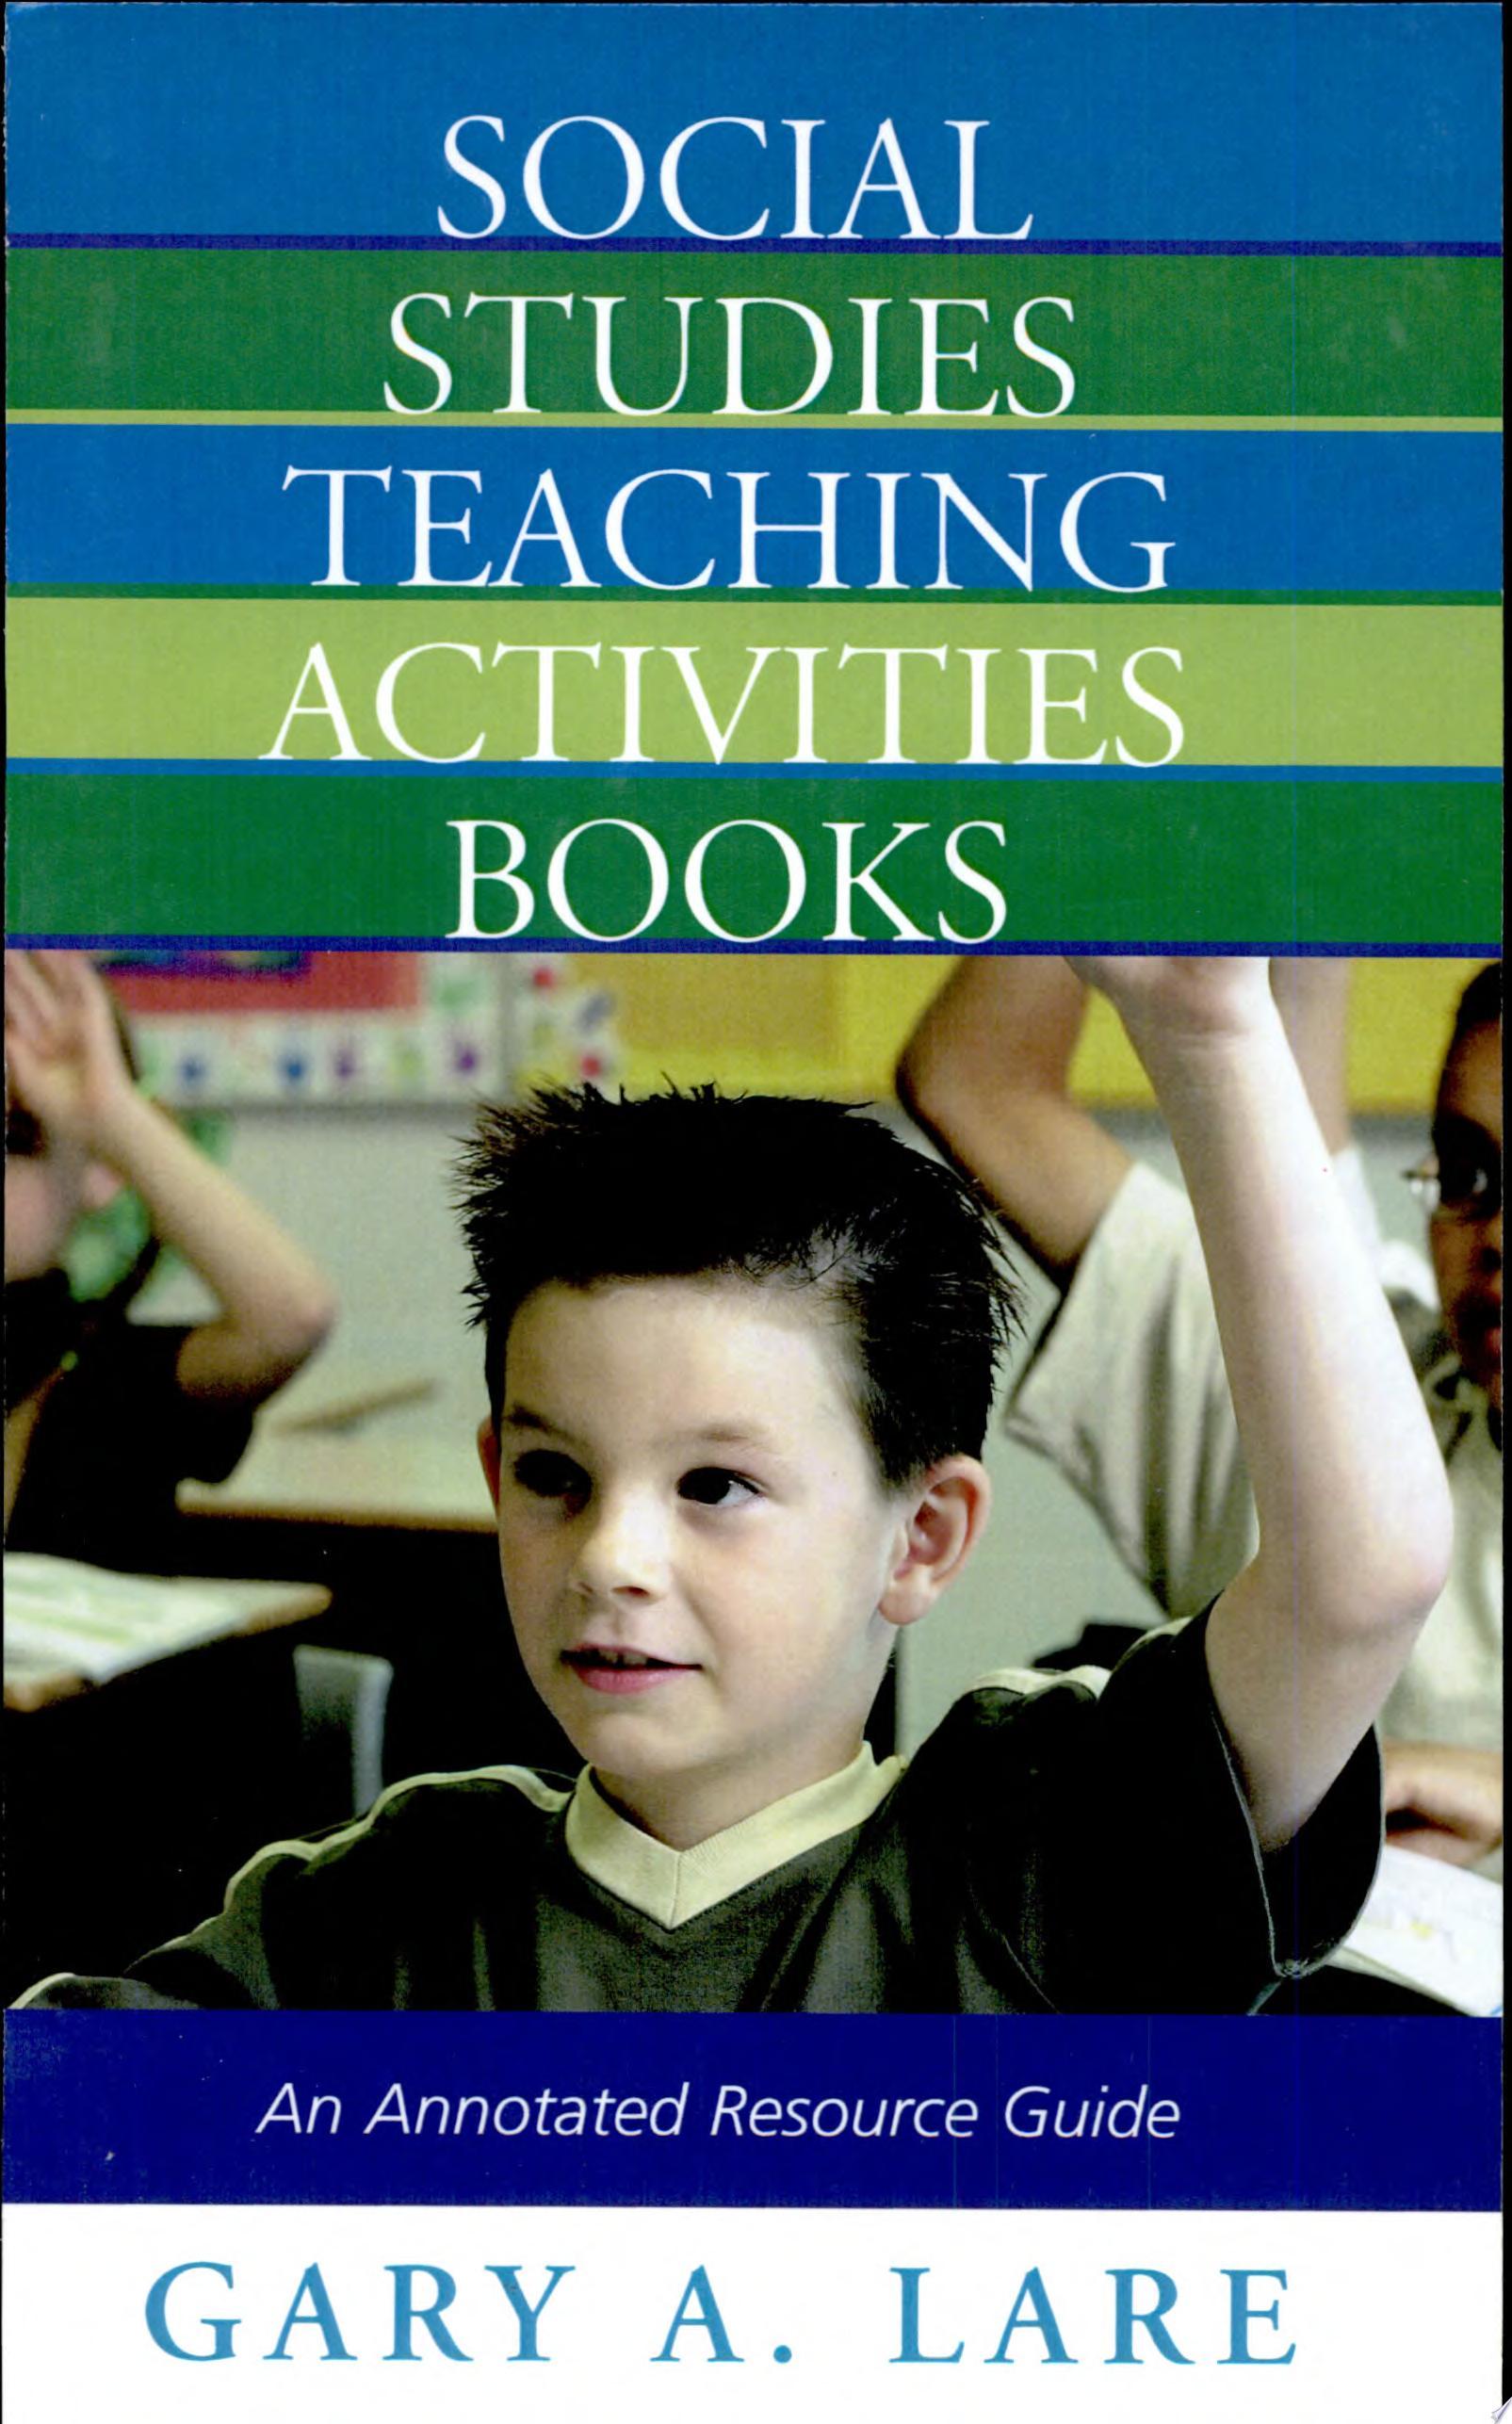 Social Studies Teaching Activities Books